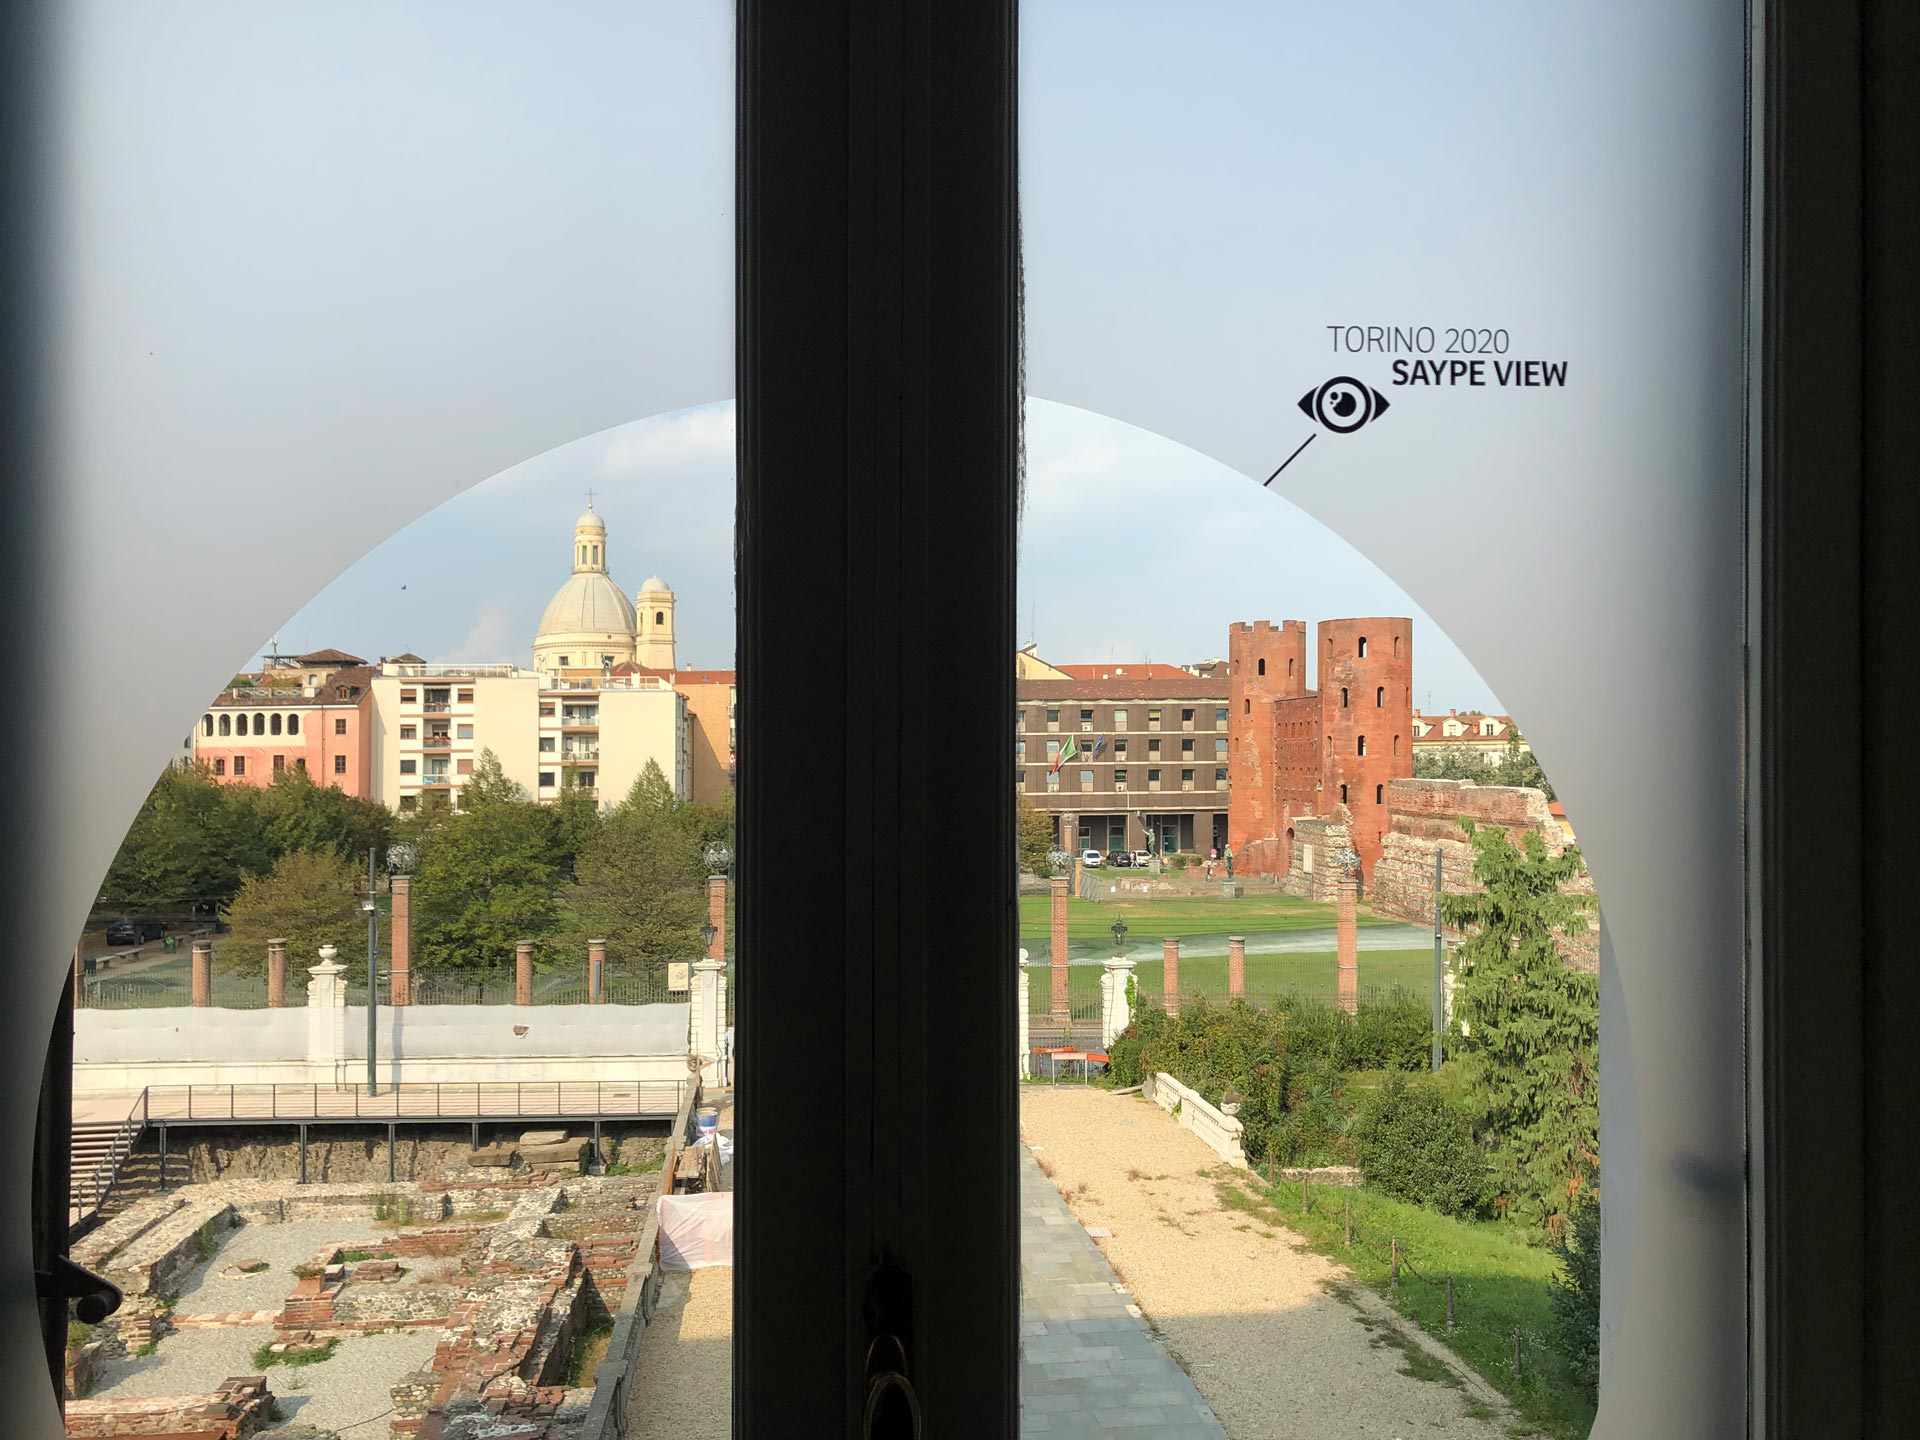 e-mage: Saype - Mostra Musei Reali Torino